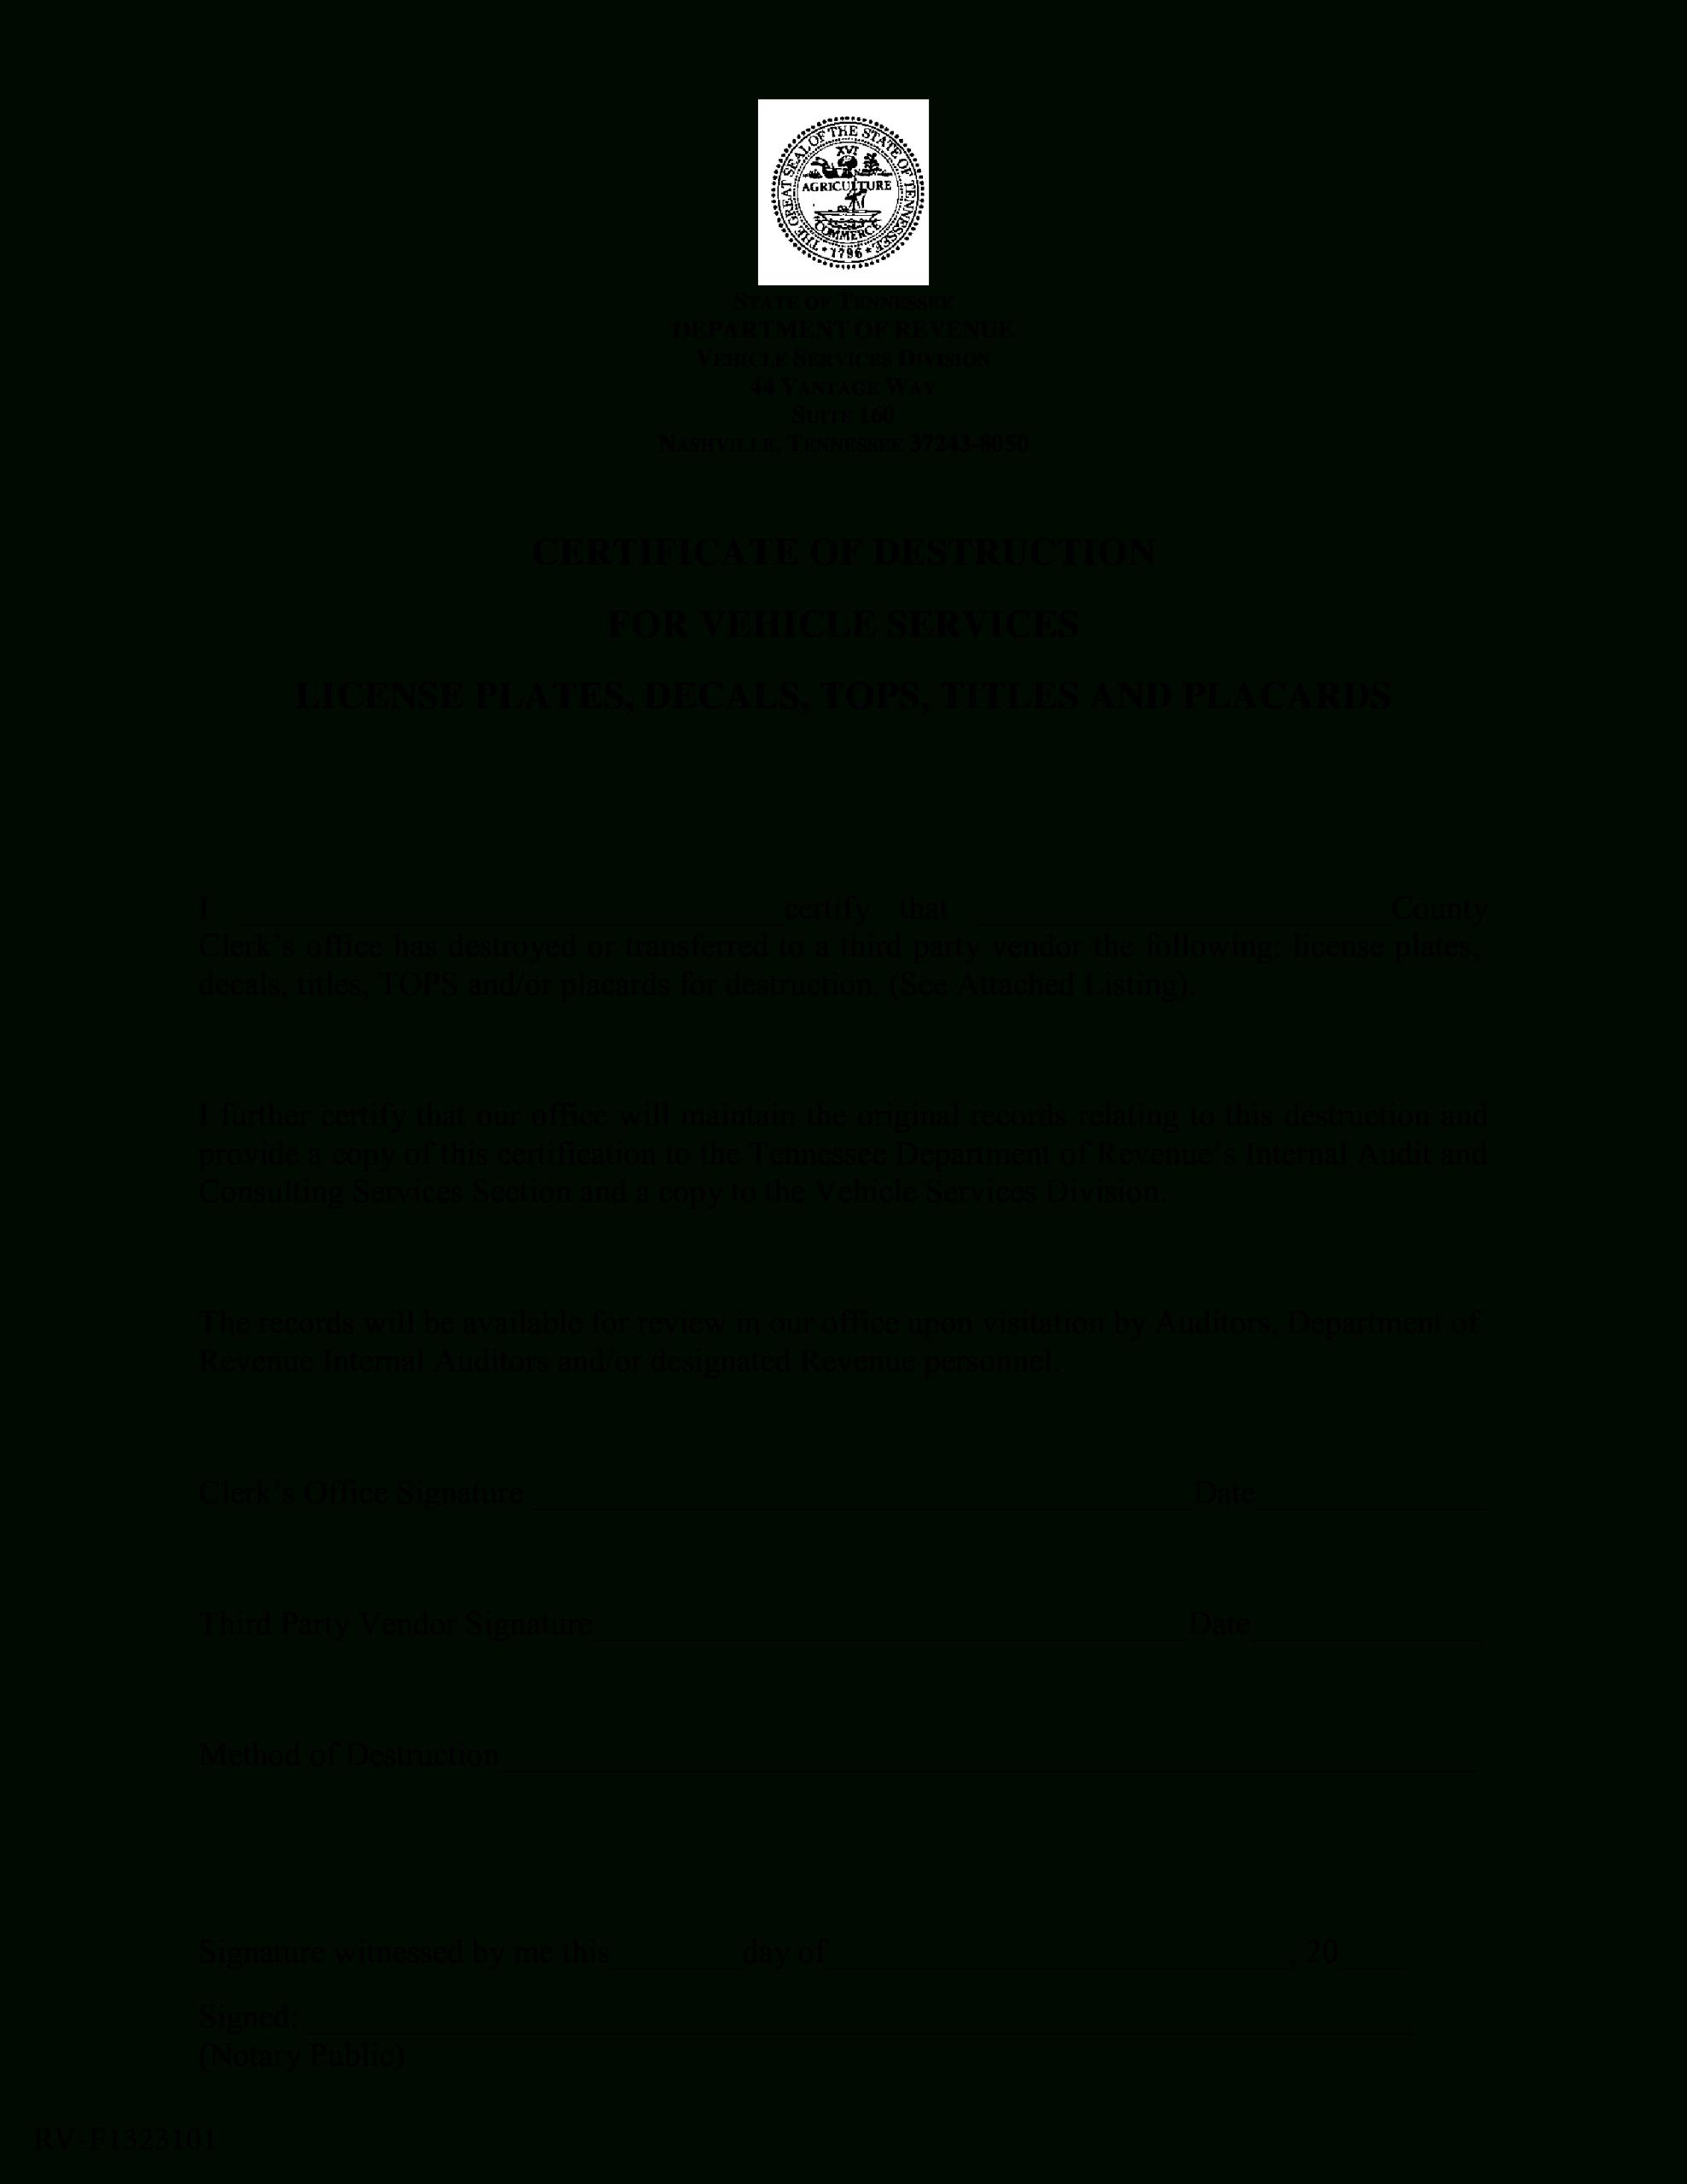 Vehicle Certificate Of Destruction   Templates At Regarding Certificate Of Destruction Template